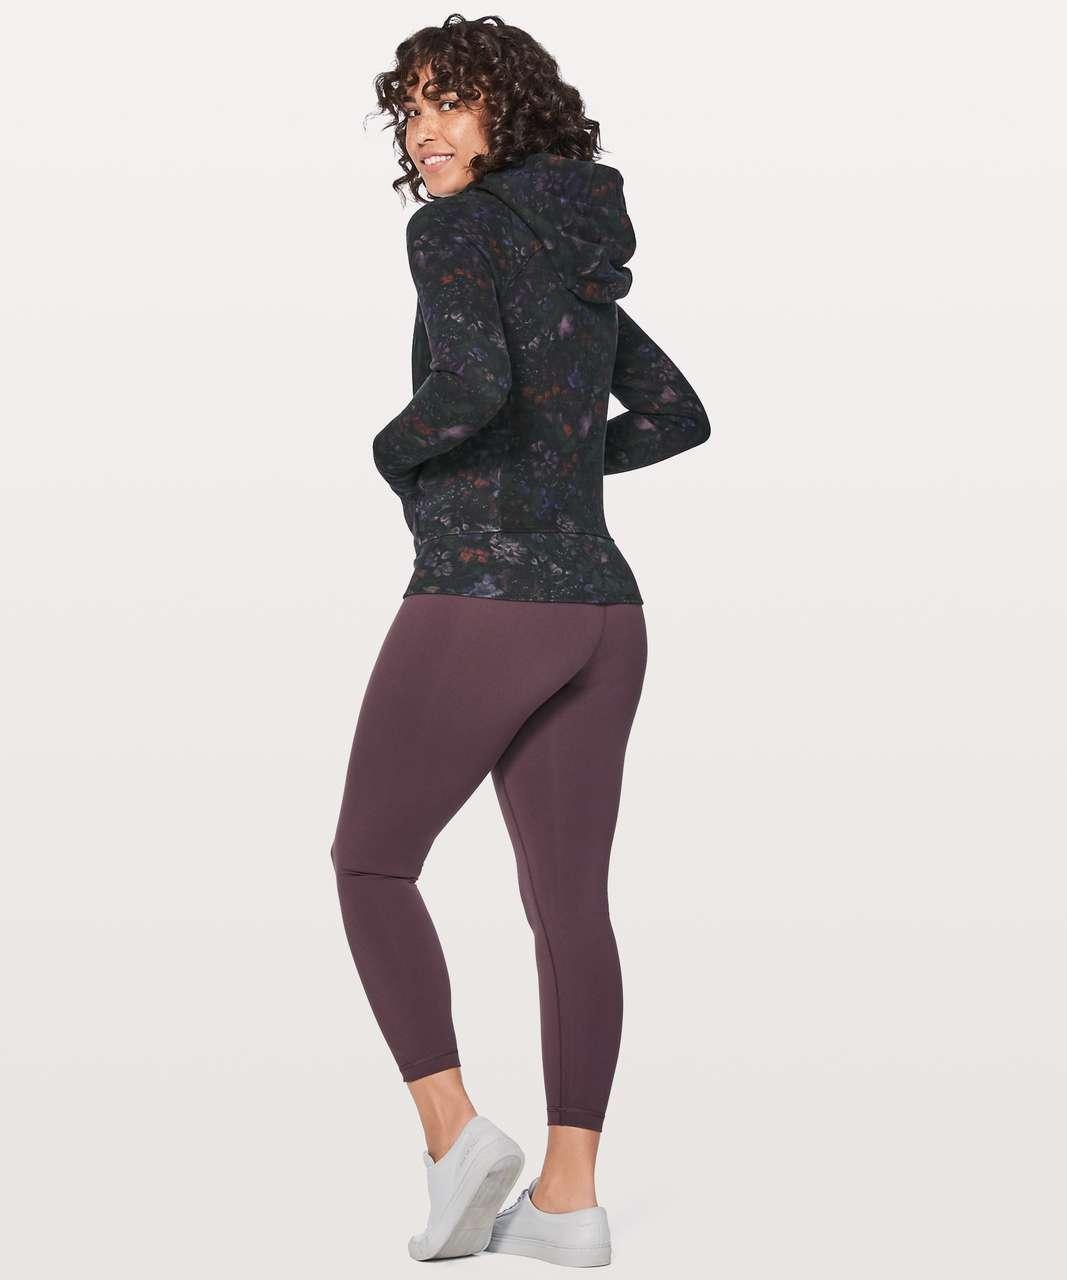 Lululemon Scuba Hoodie Light Cotton Fleece - Frozen Flourish Multi / Black